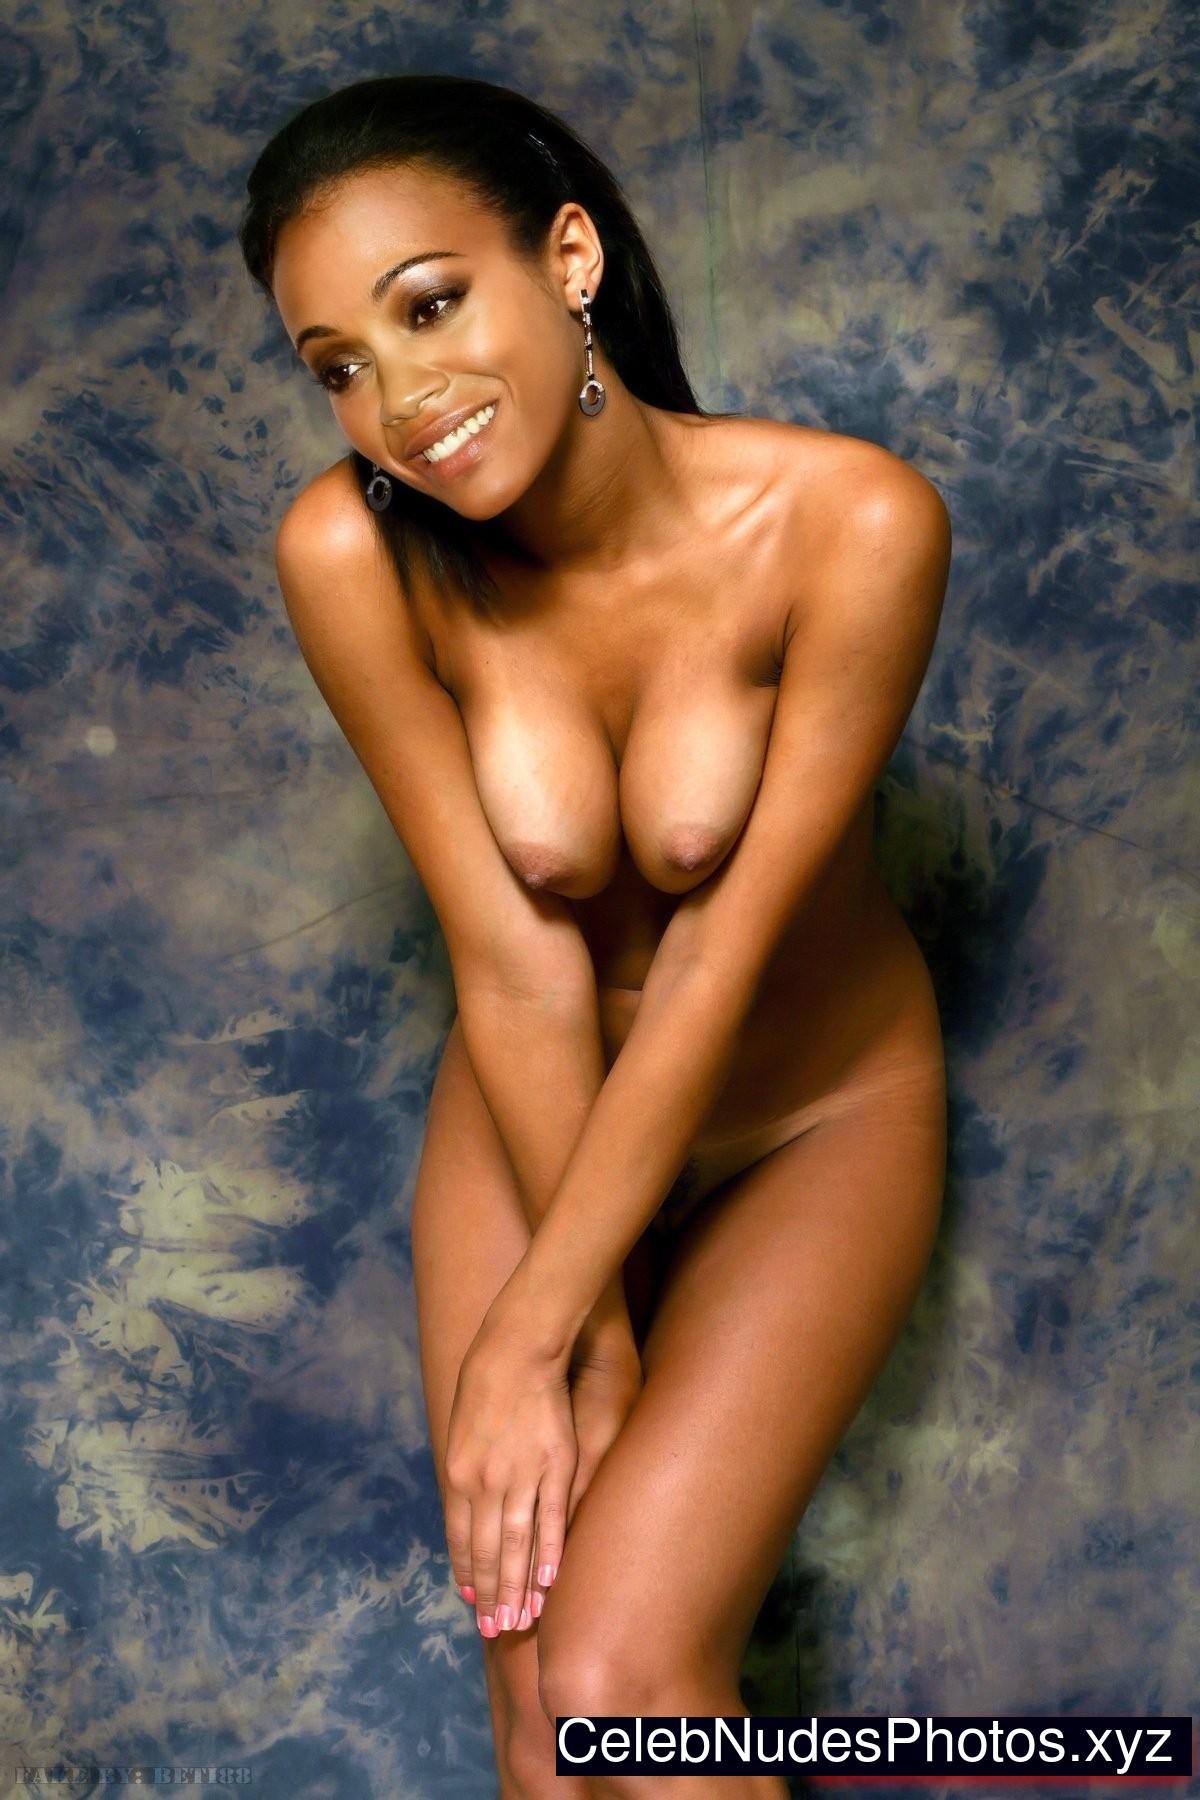 zoe saldana sexy nude